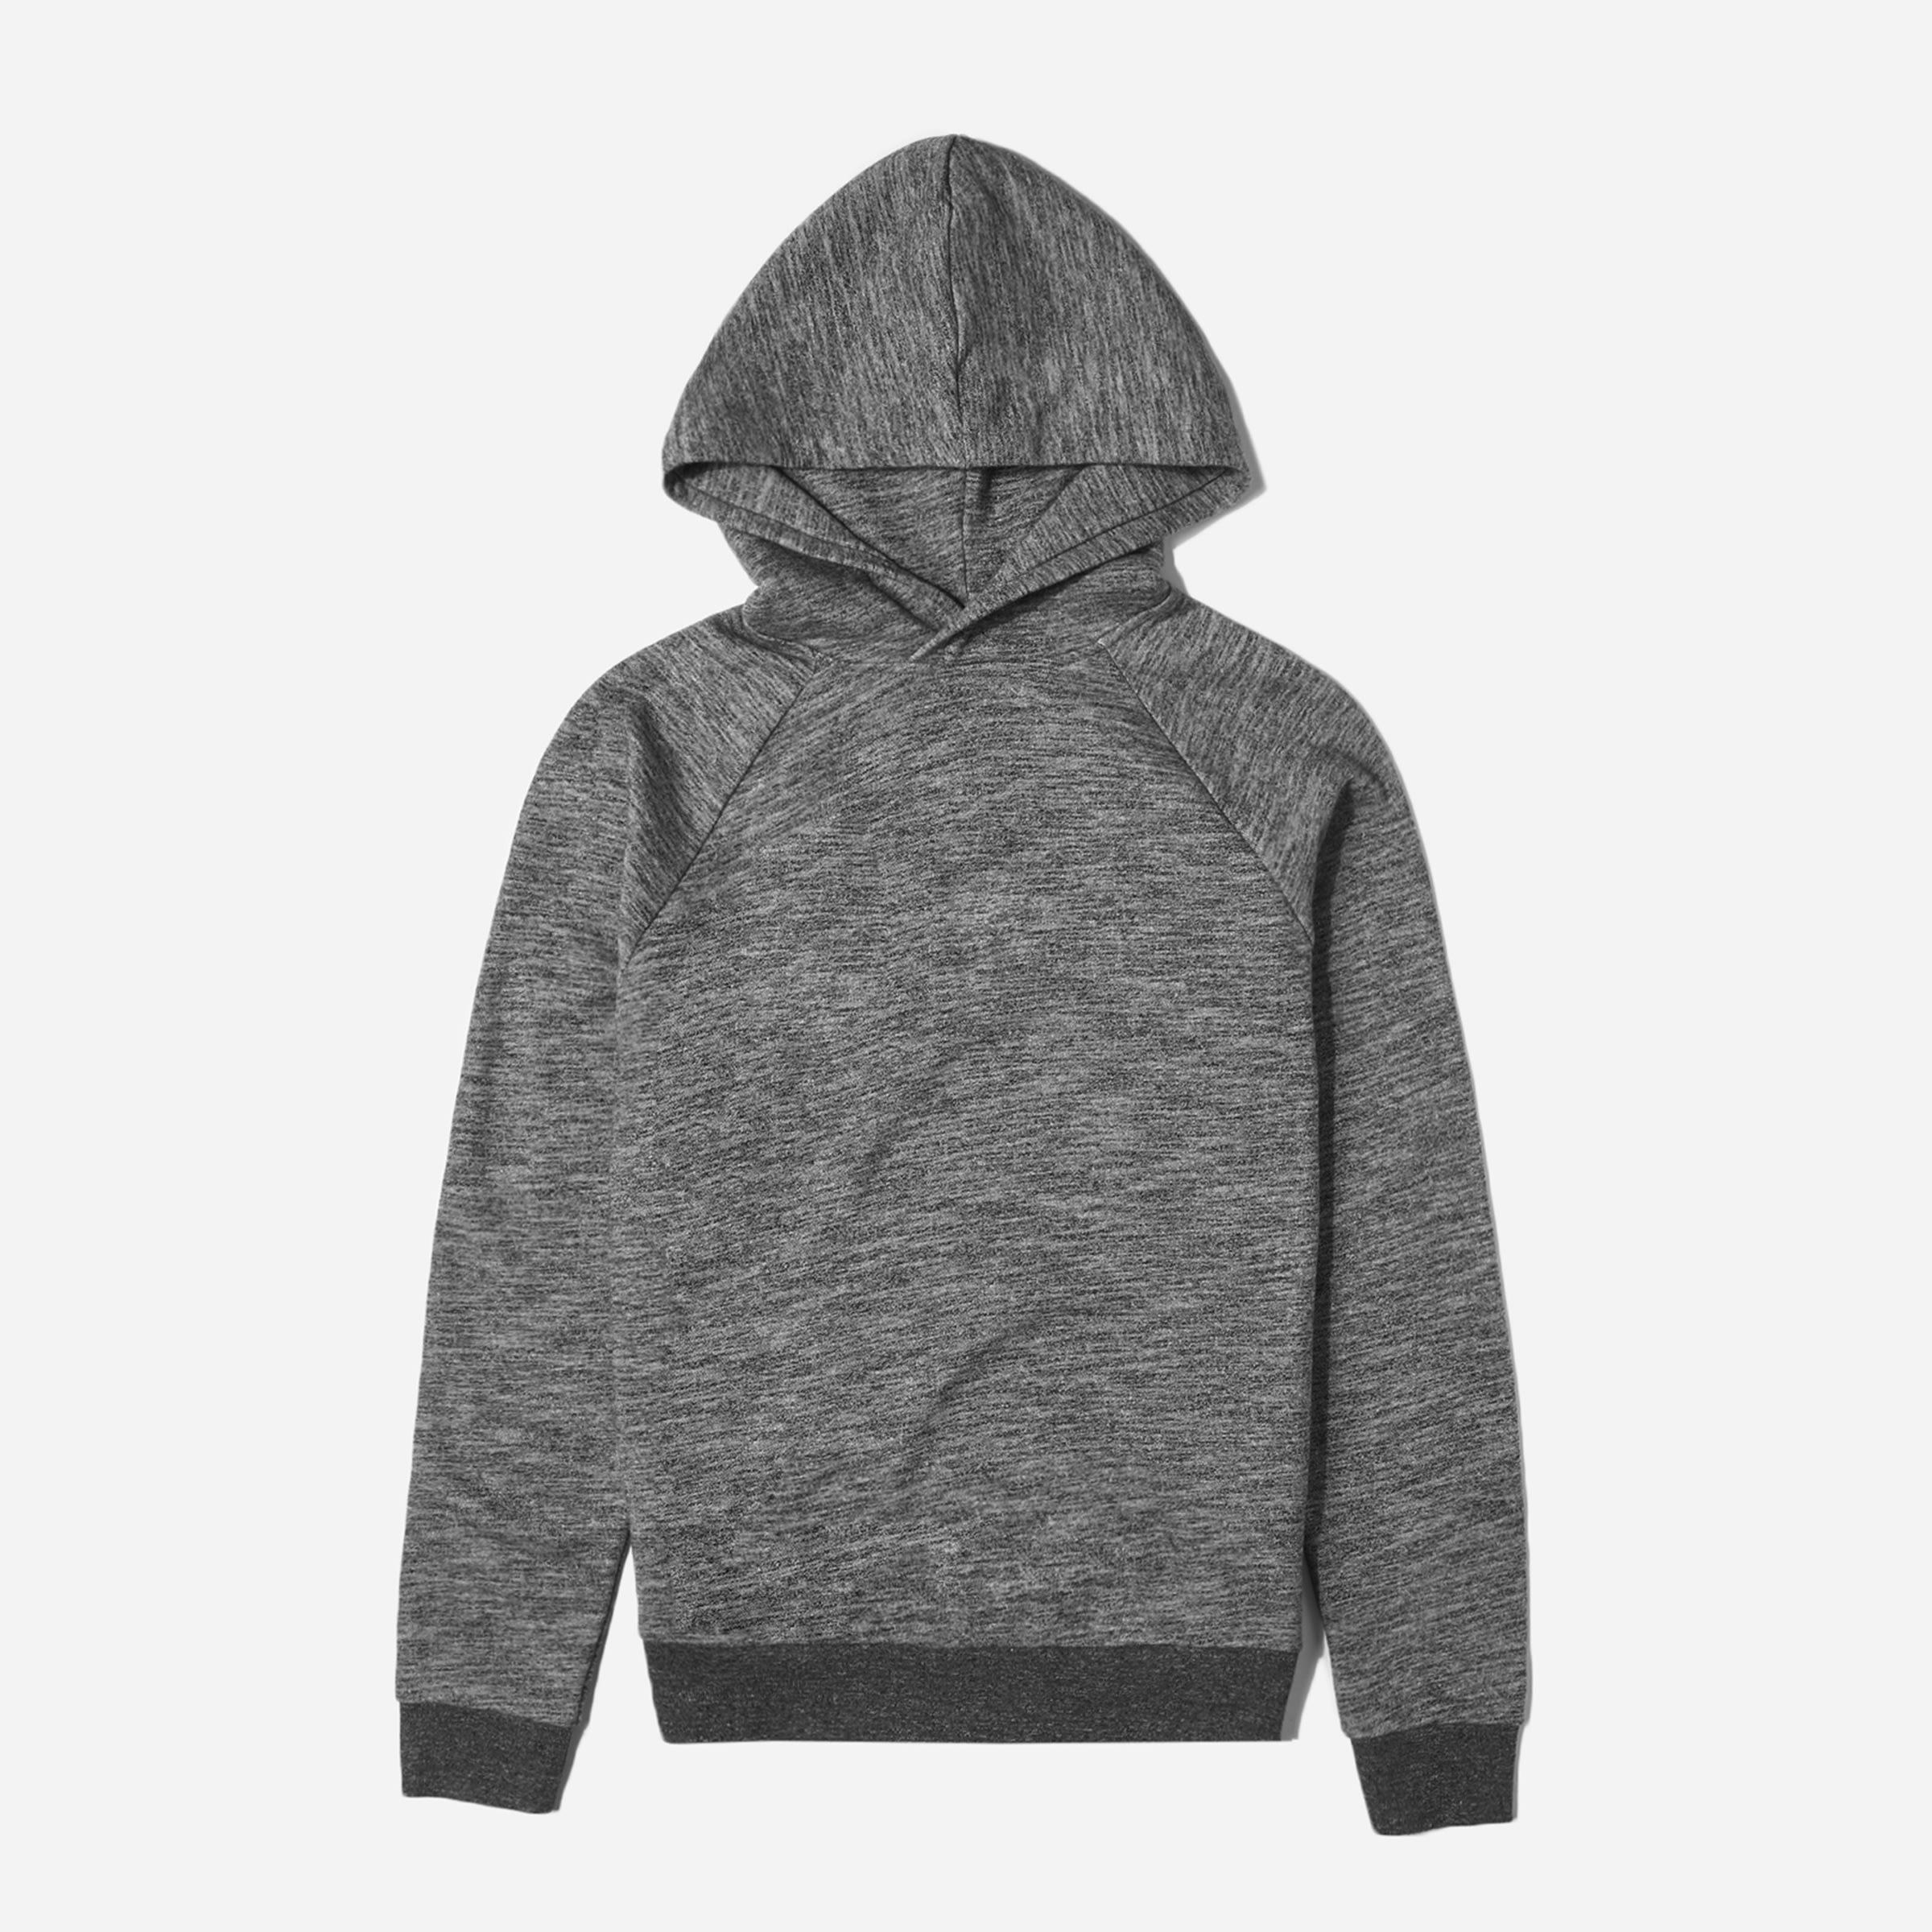 Difference Between Sweater Sweatshirt And Hoodie